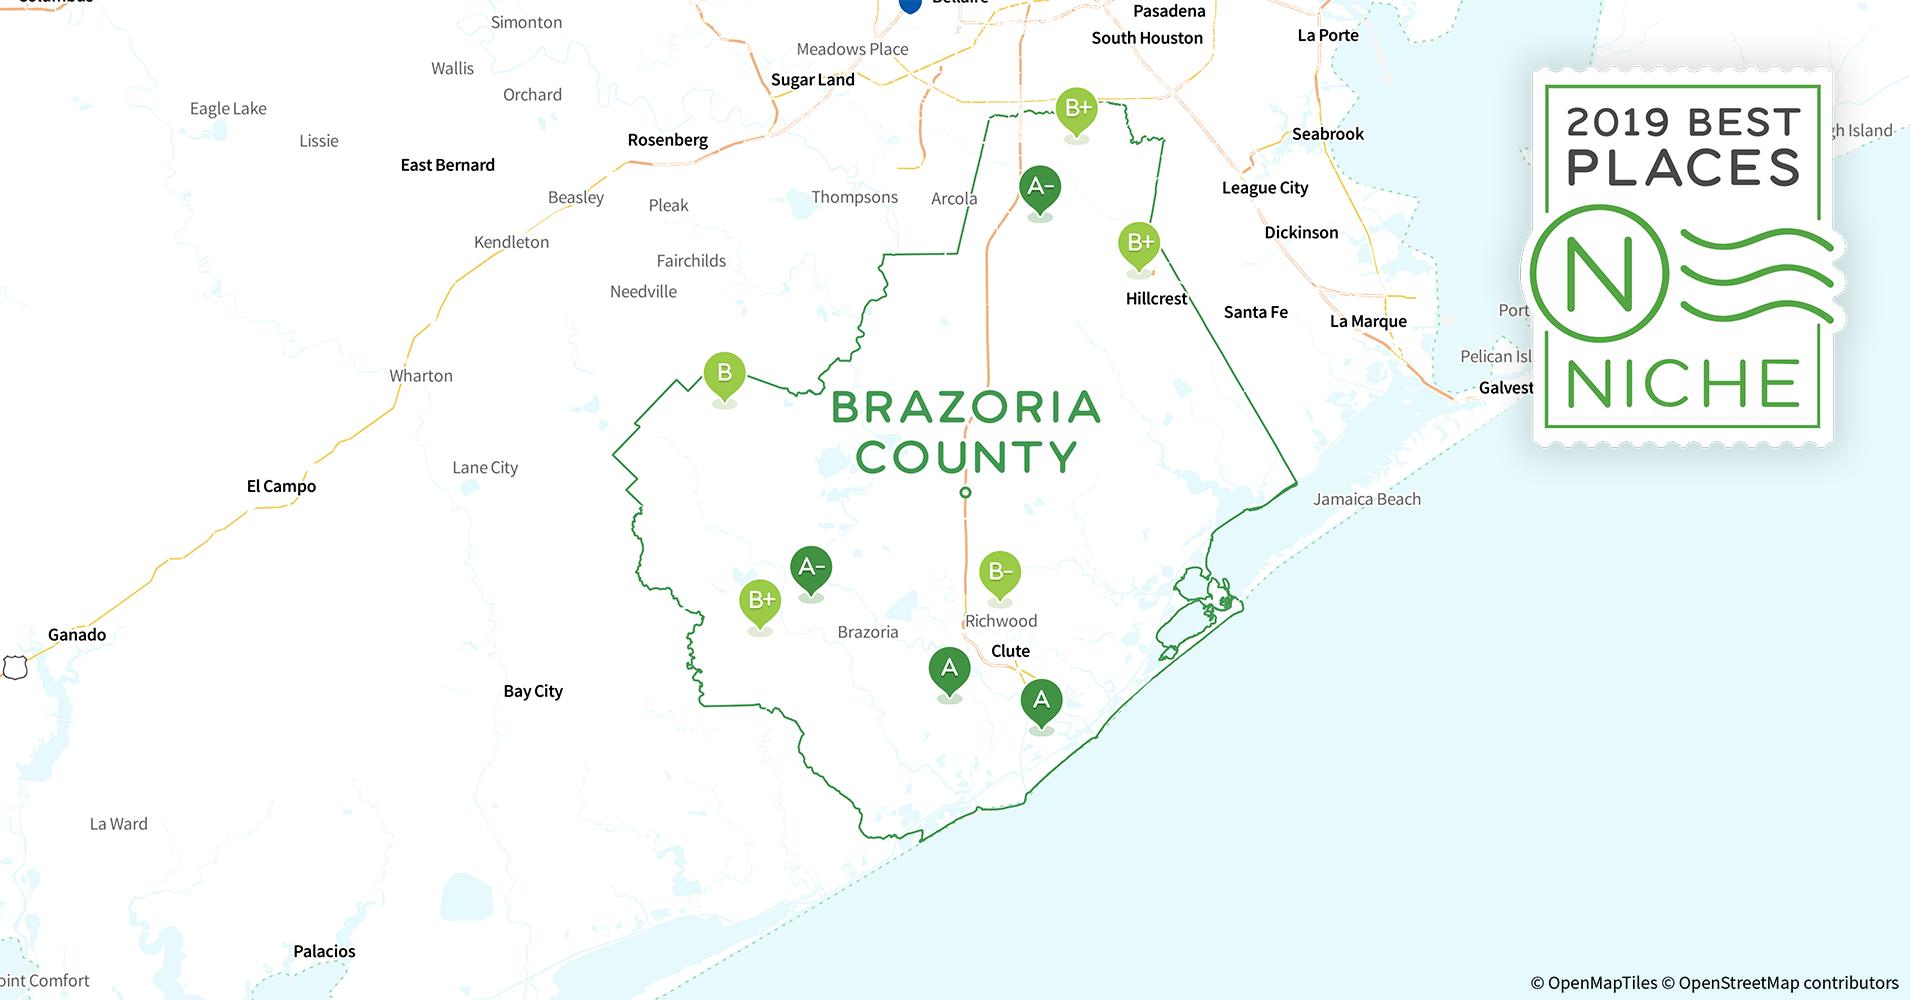 2019 Safe Places to Live in Brazoria County, TX - Niche